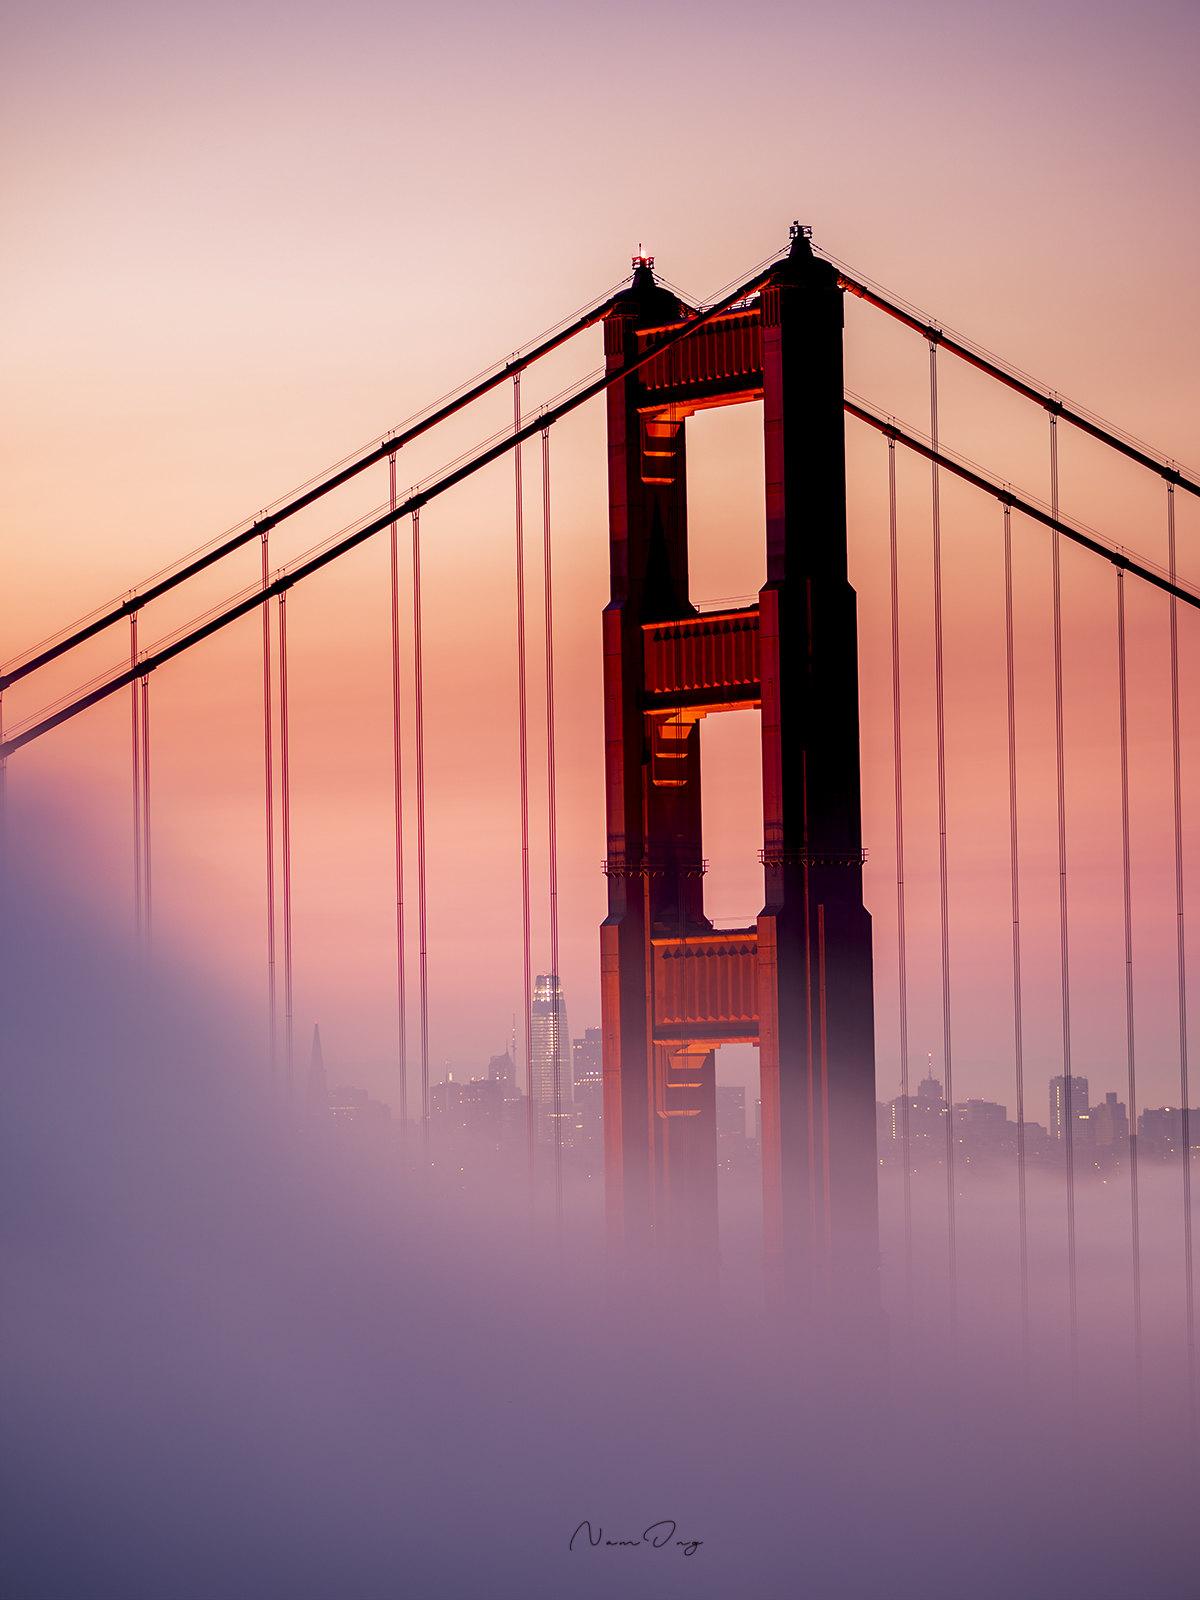 Golden Gate Bridge [+1 - 12-9-2018] 37167860665_994fdff5be_h